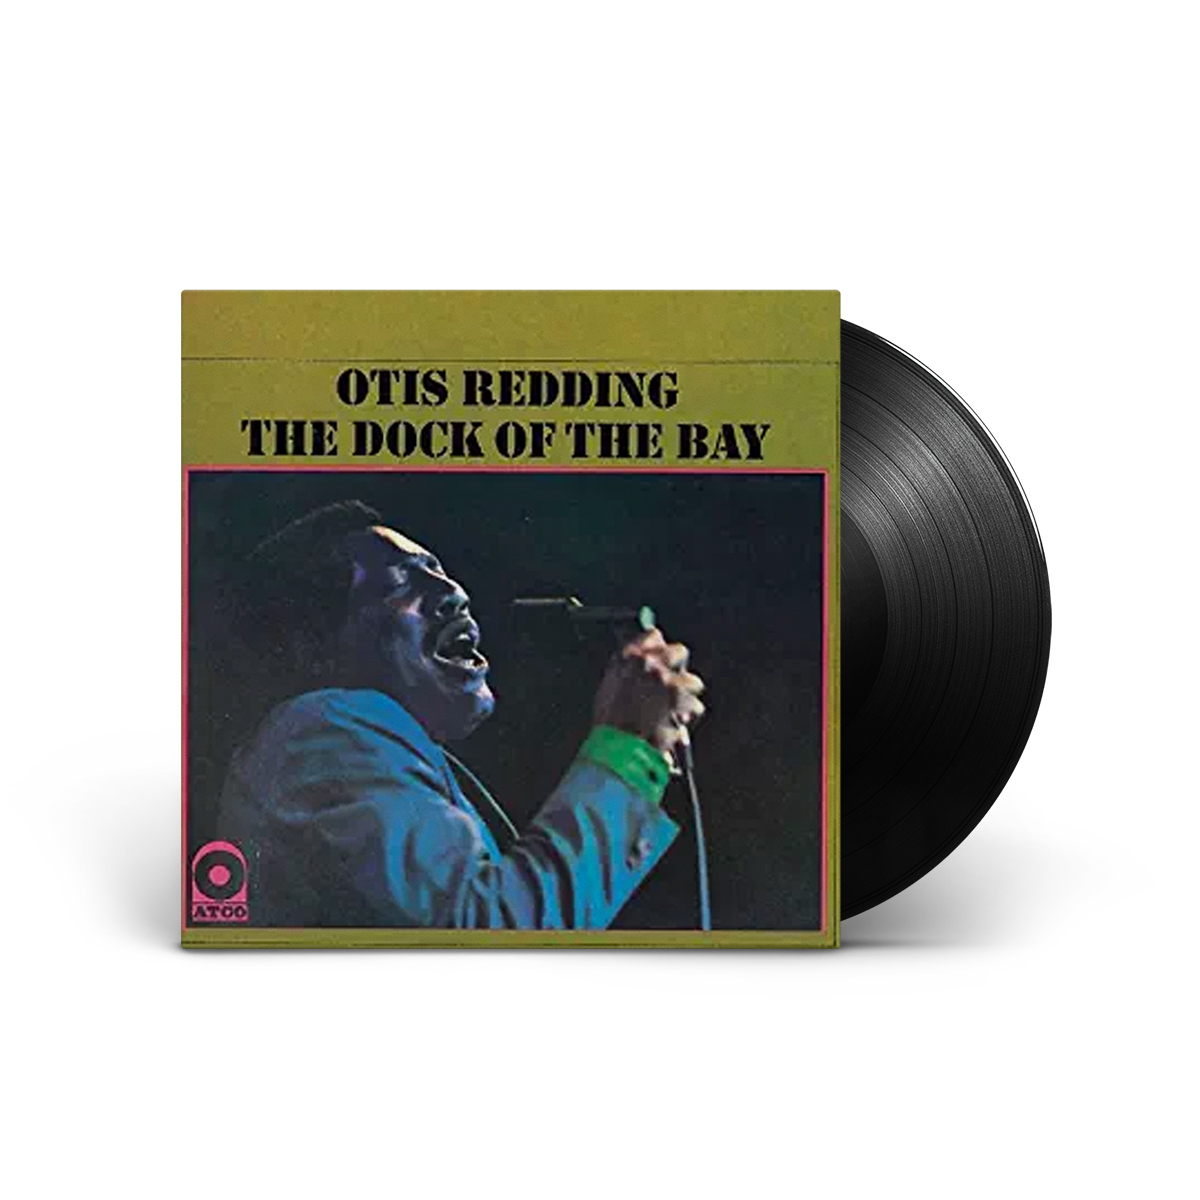 Otis Redding Dock of the Bay LP